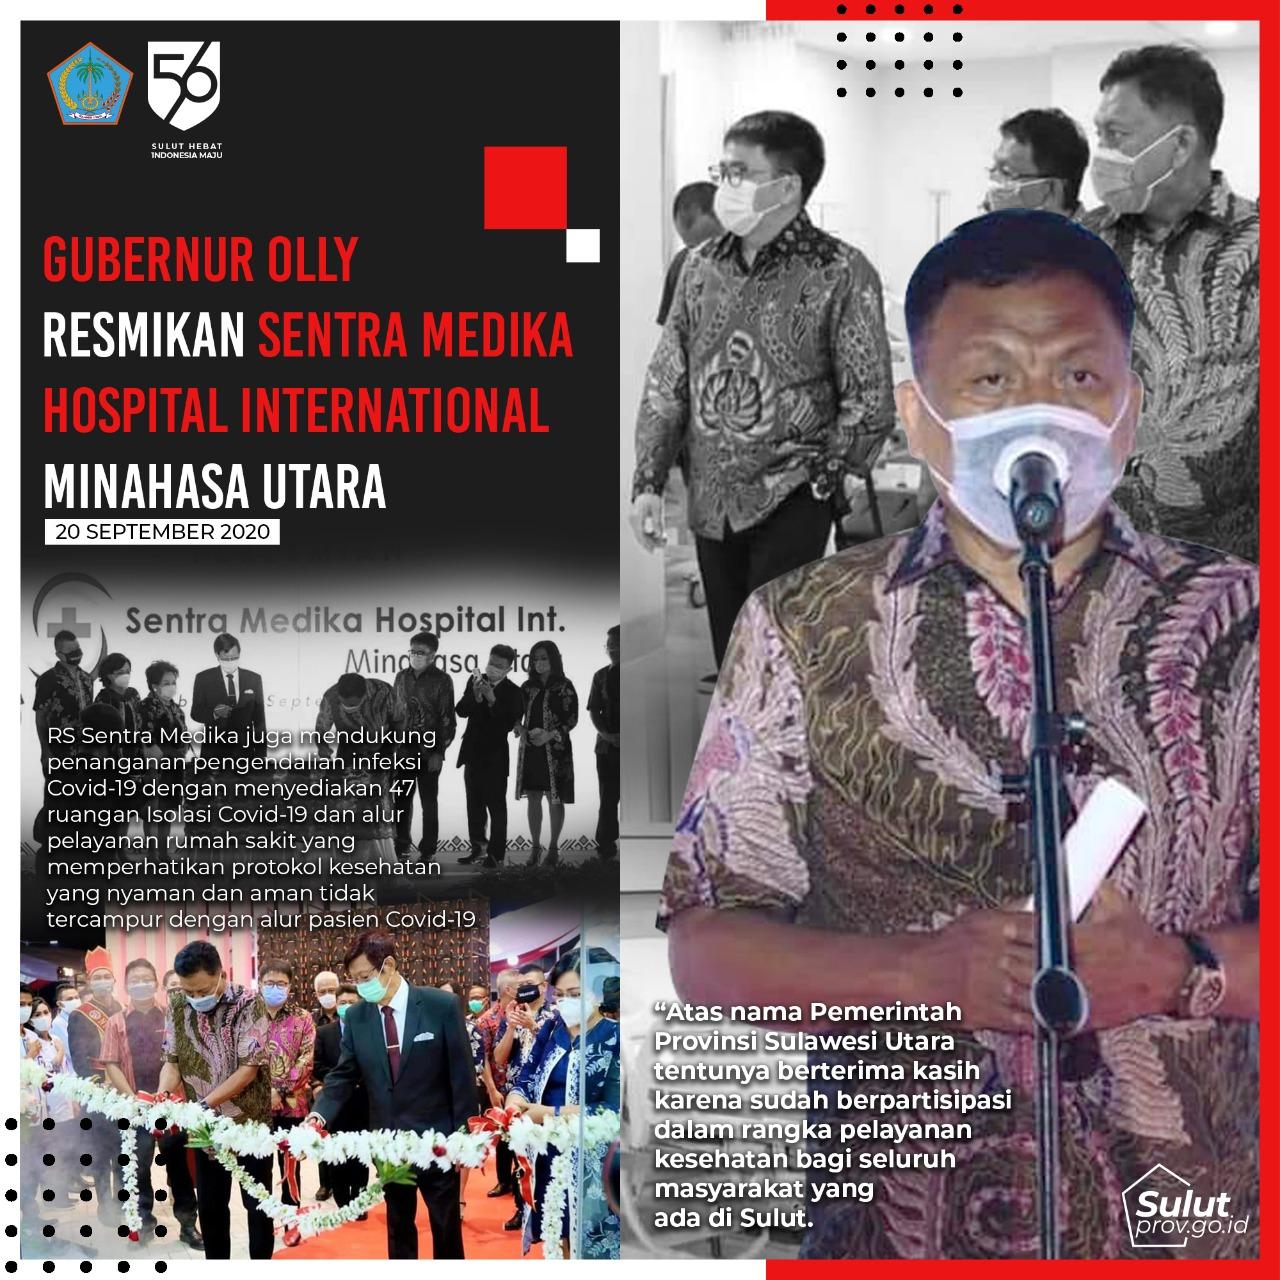 Gubernur Olly Resmikan Sentra Medika Hospital Internation Minahasa Utara